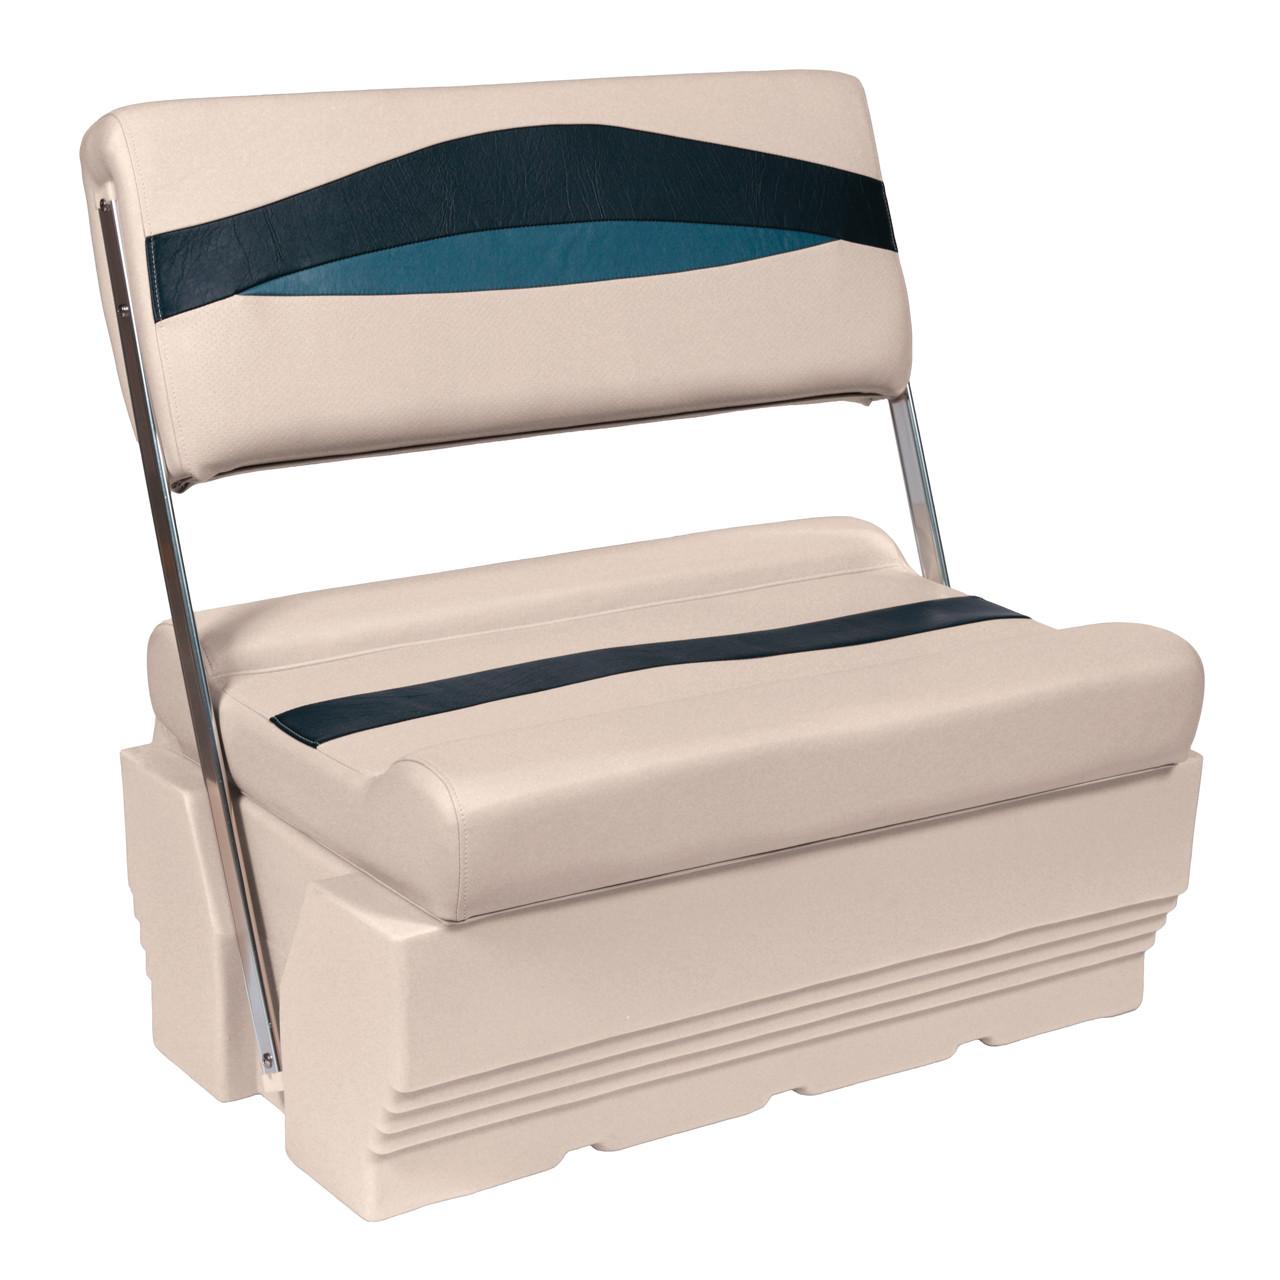 Wise Premier Pontoon Flip Flop Bench Seats Bm1152 Free